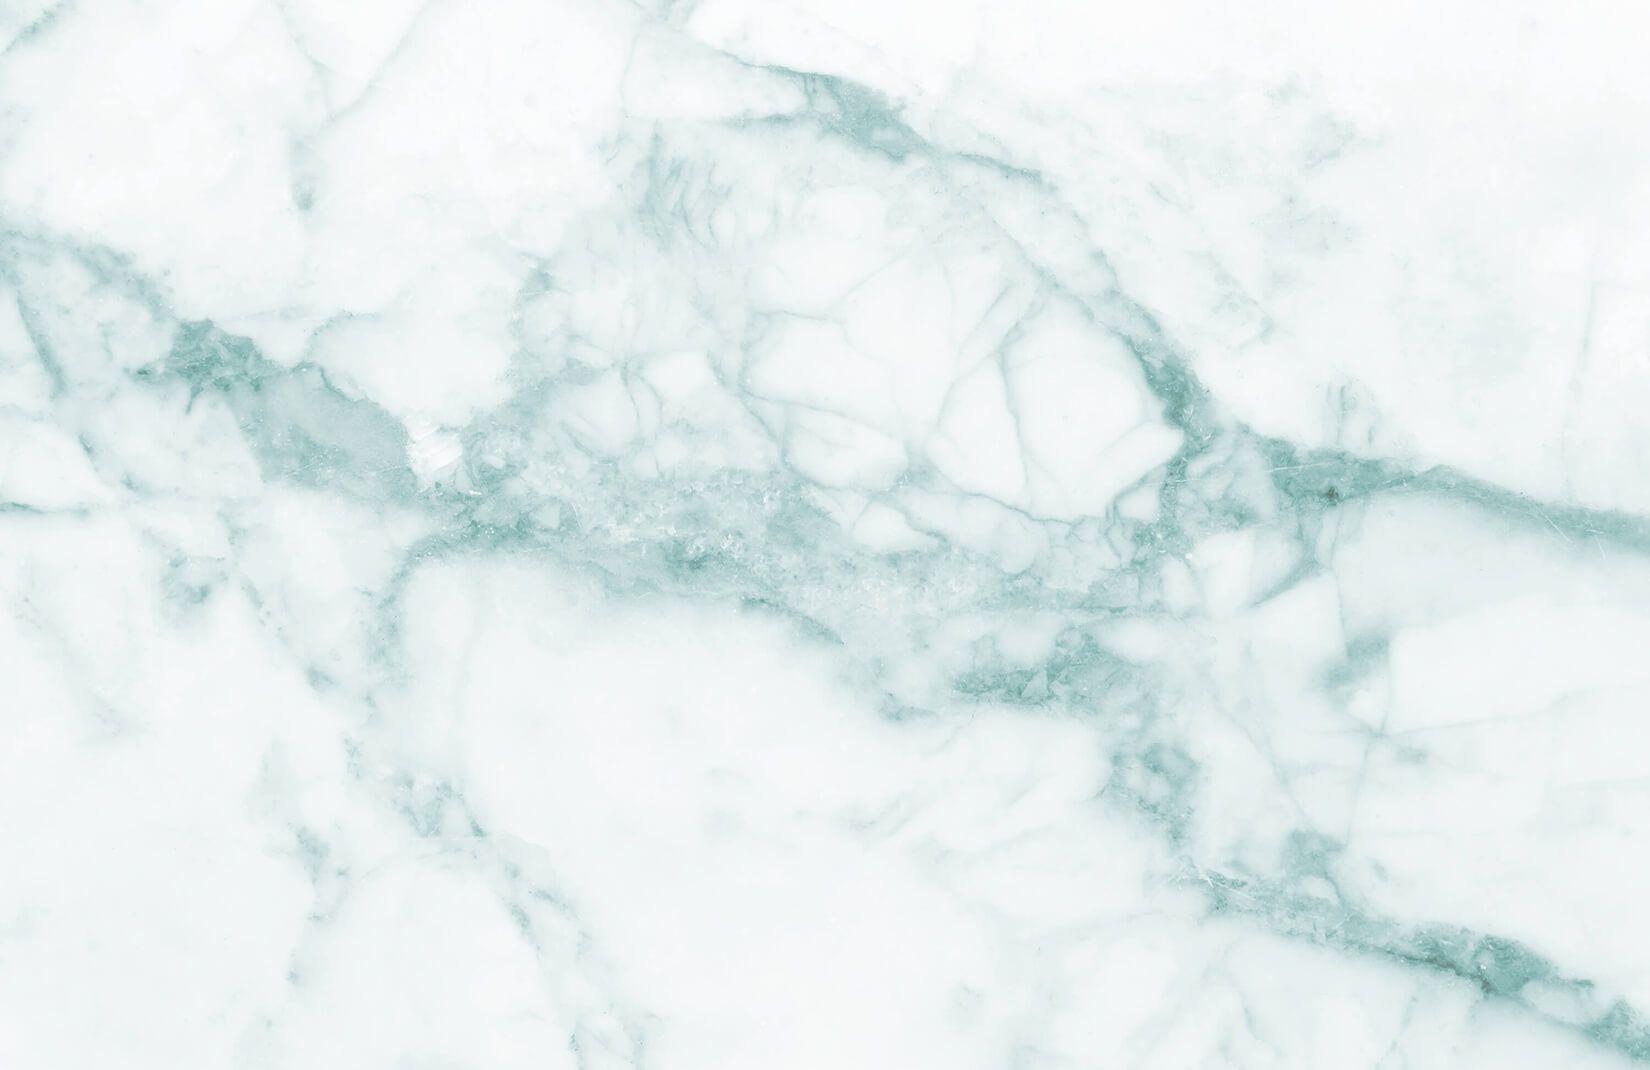 White Green Marble Wallpaper Mural Hovia Teal Marble Wallpaper Marble Wallpaper Green Marble